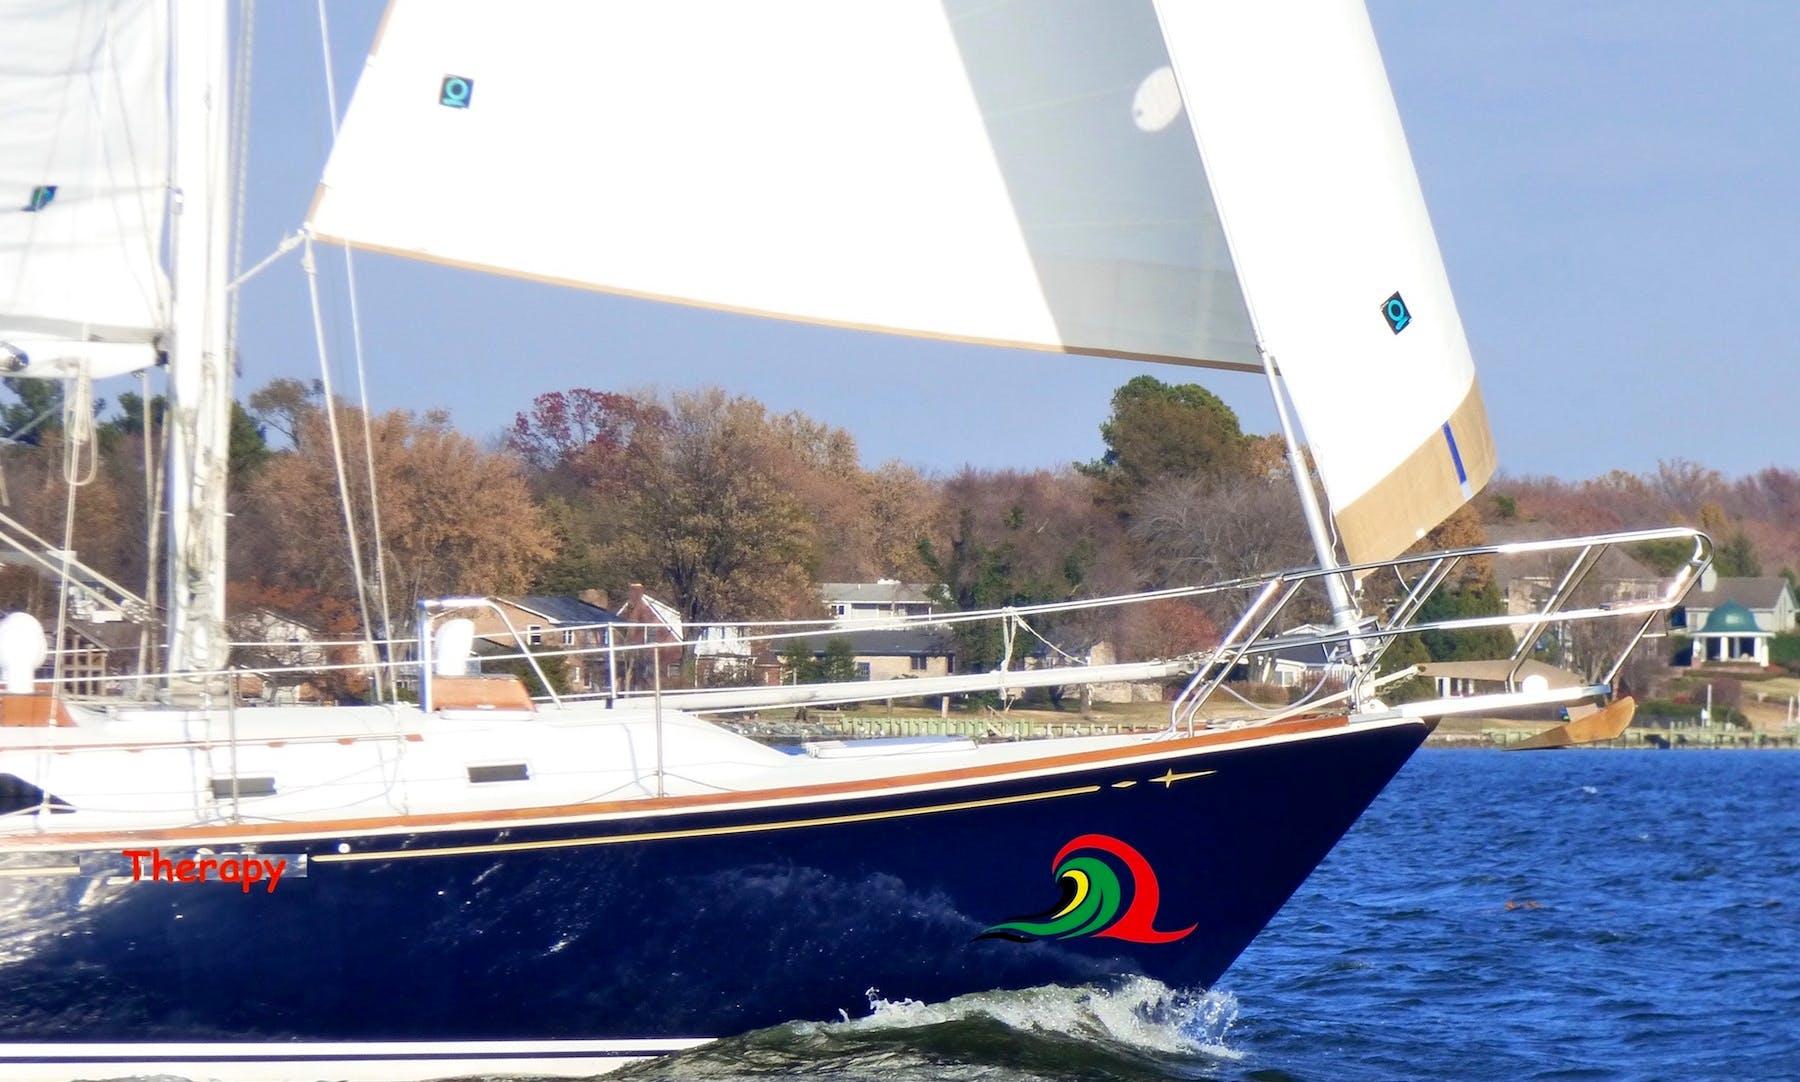 43' Sailboat Rental in Chesapeake Bay, Annapolis MD